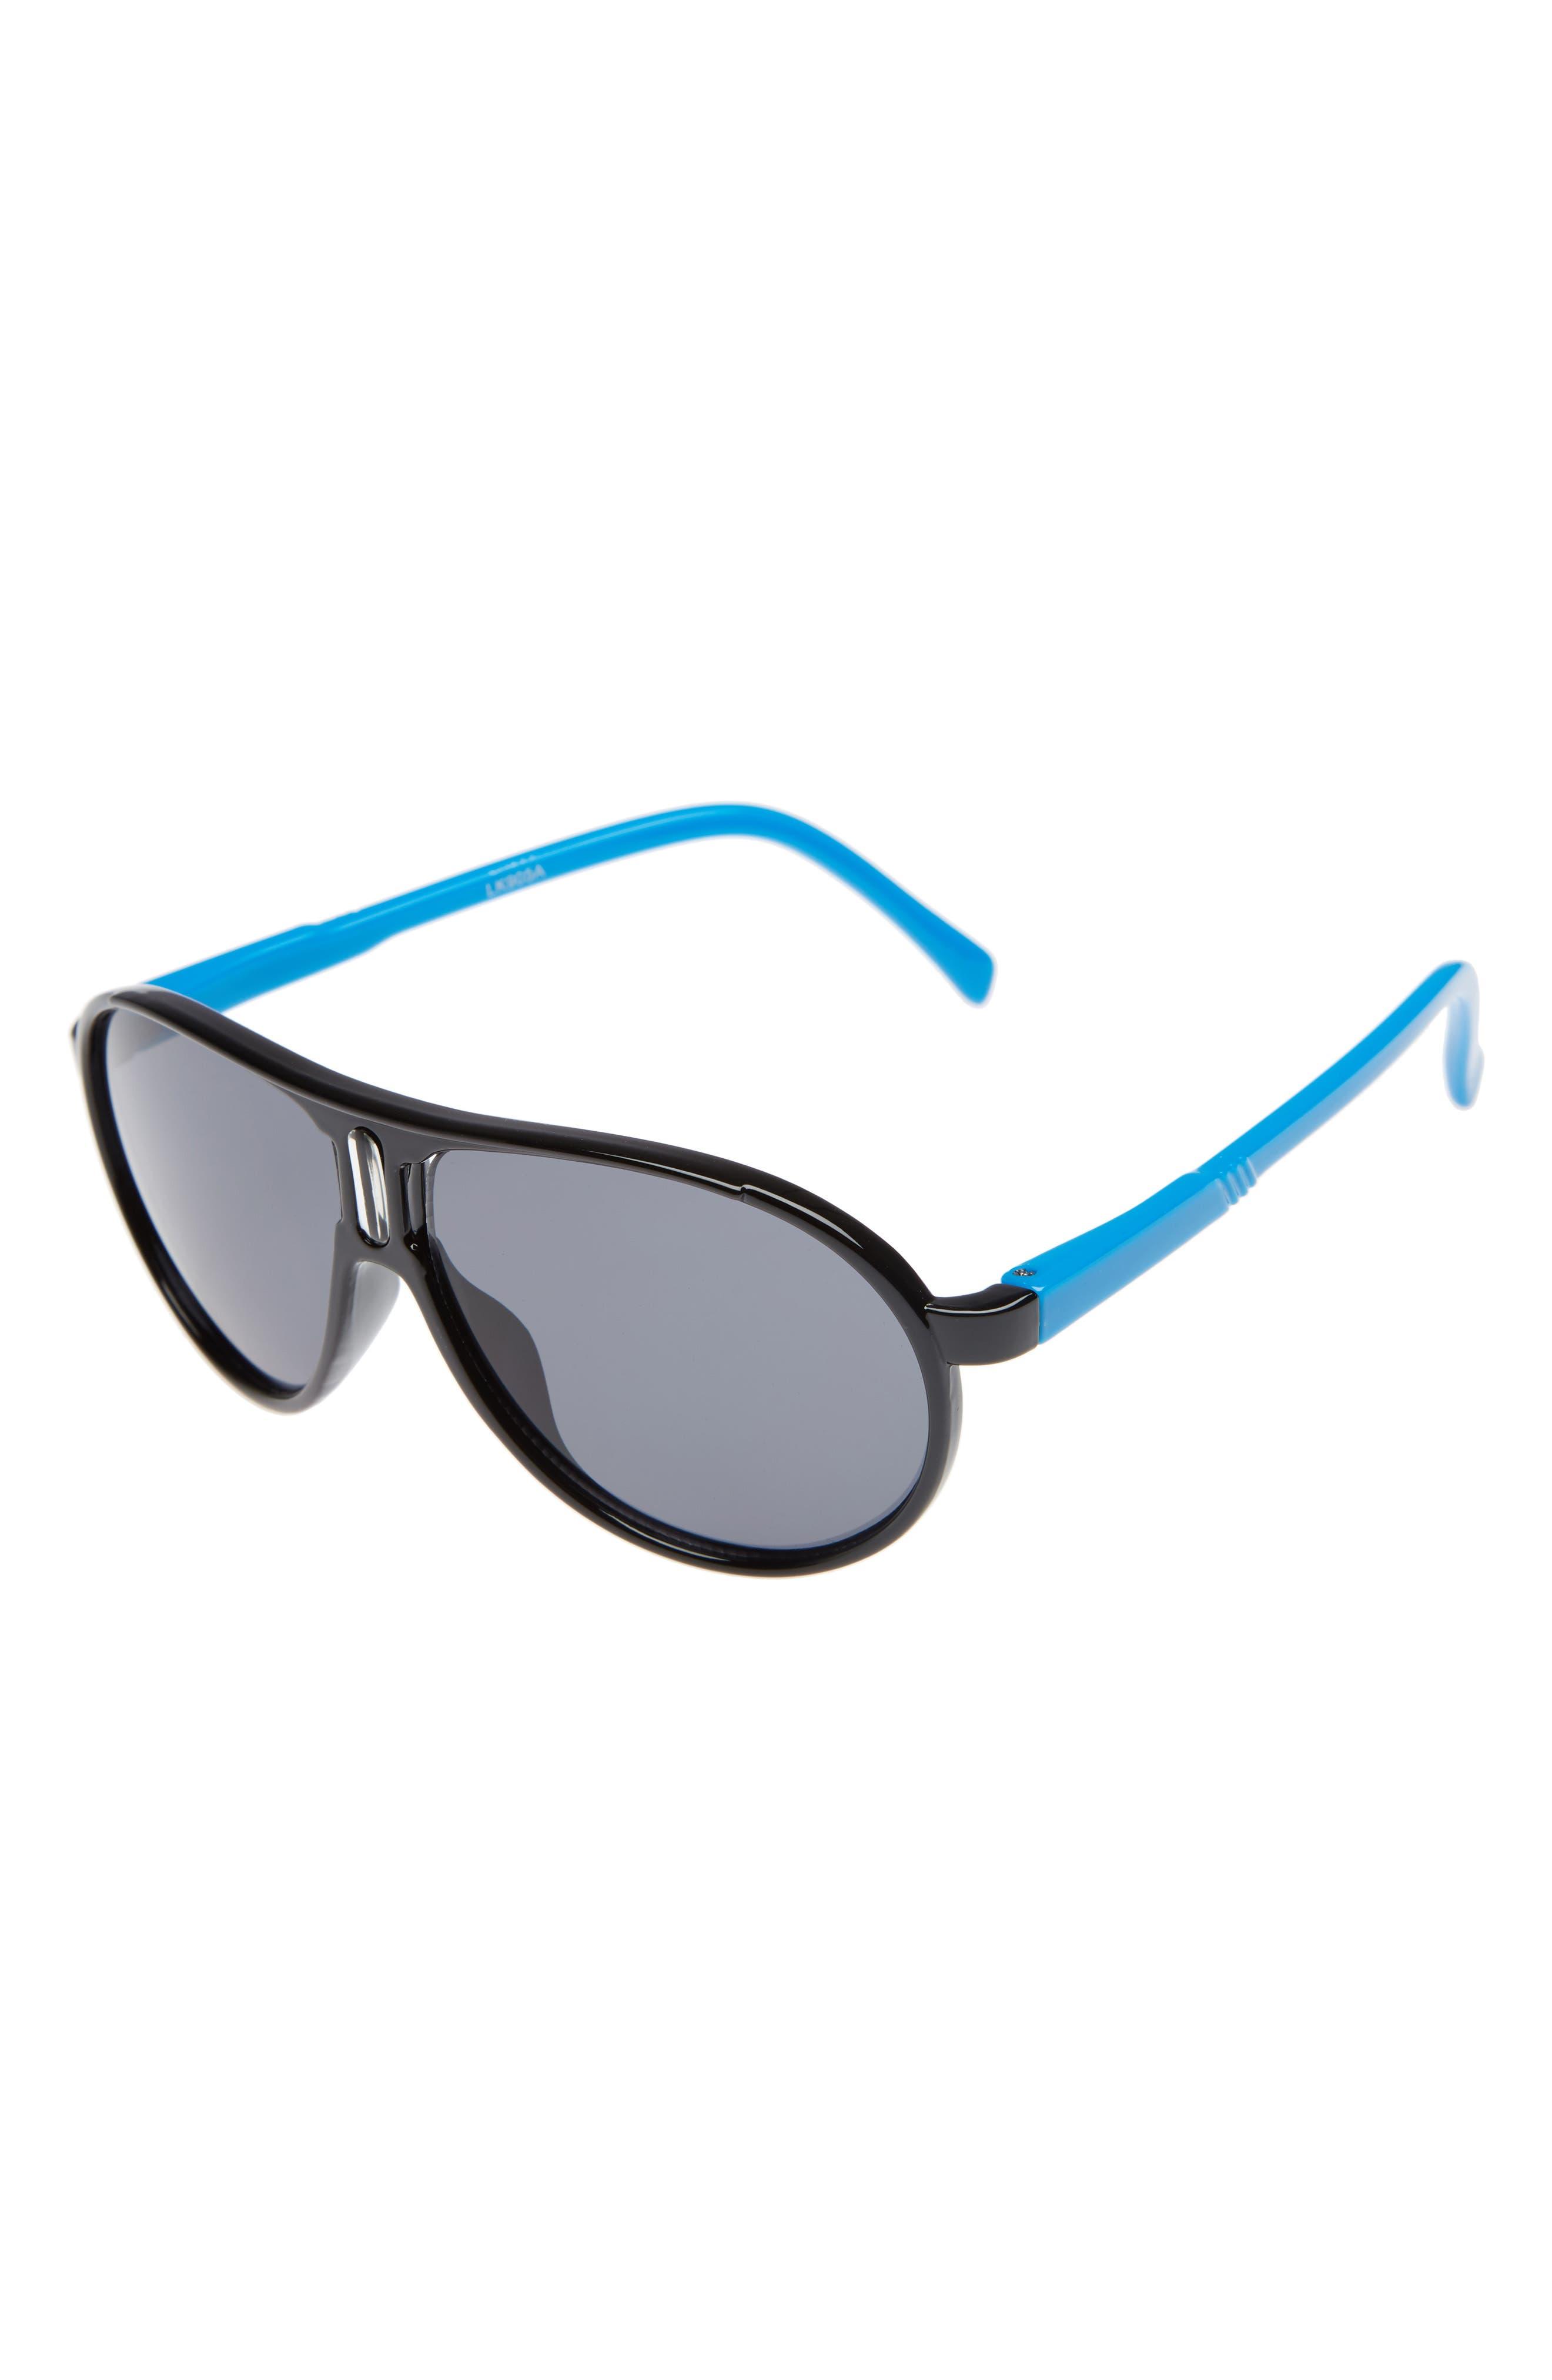 Loose Leaf Eyewear Aviator Sunglasses (Baby)